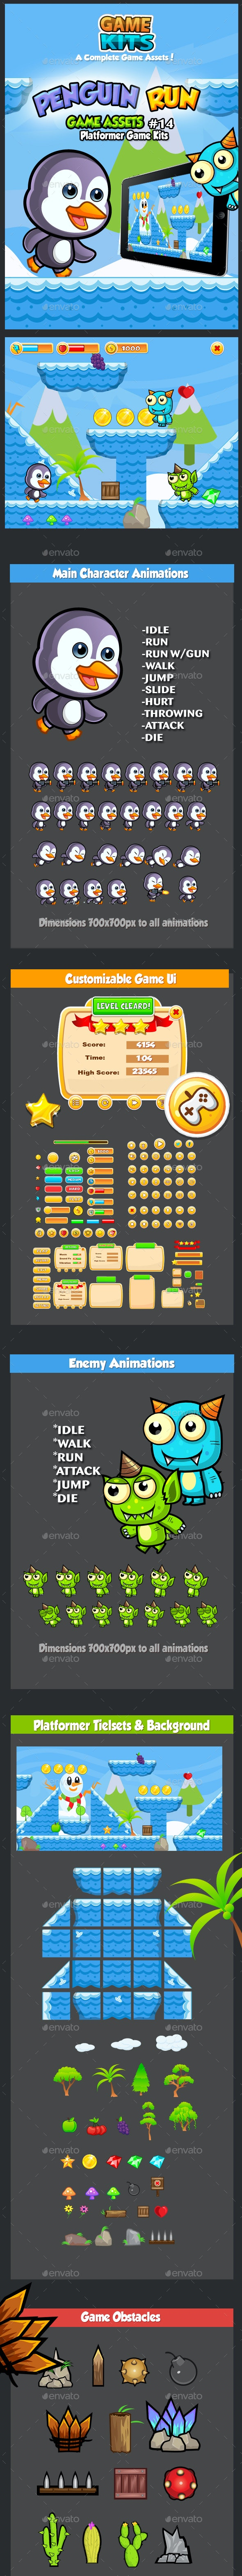 Penguin Run Platformer Game Assets 14 - Game Kits Game Assets